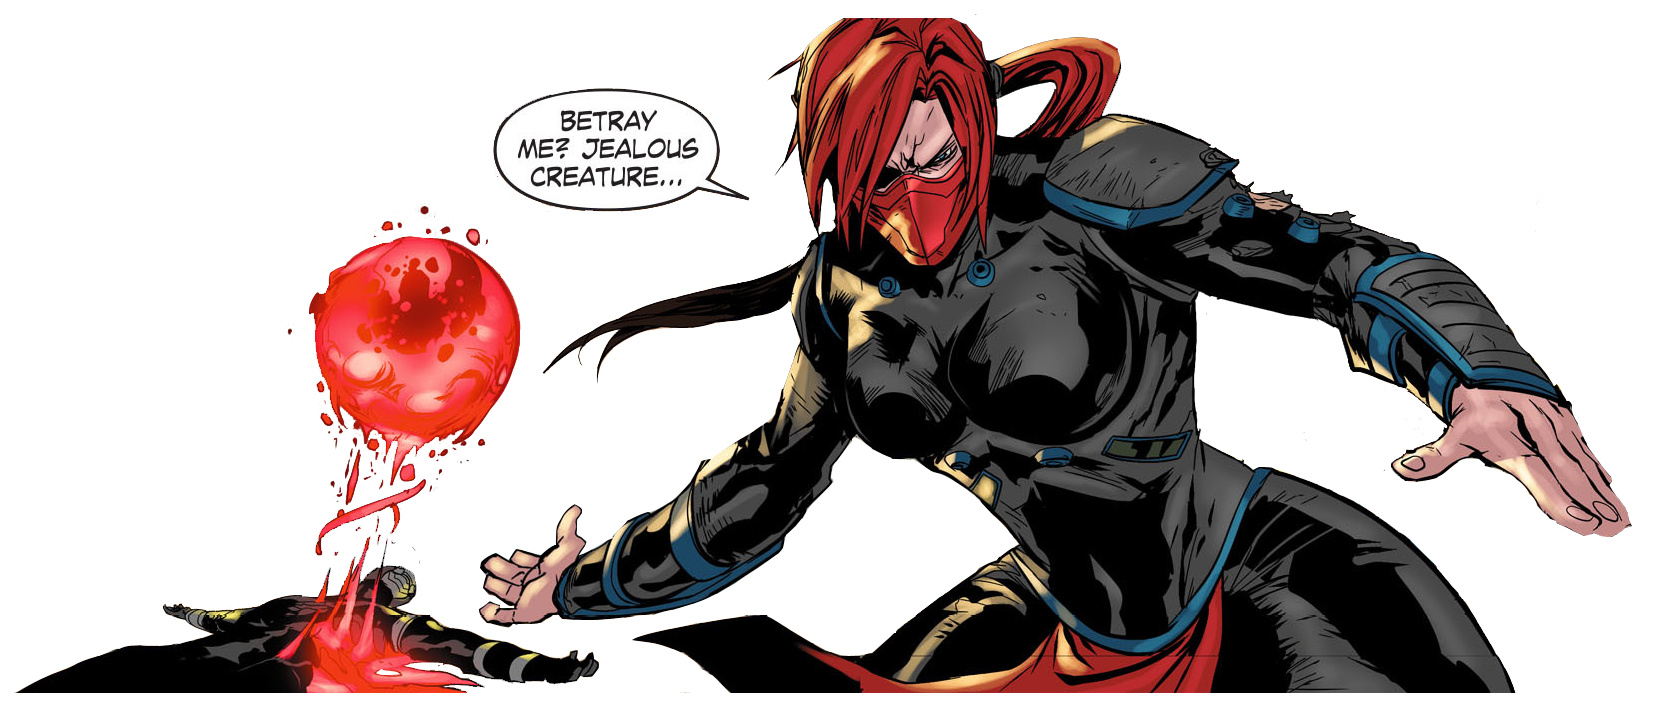 Skarlet cutout mortal kombat x comic by chimera495-d92plnb.png